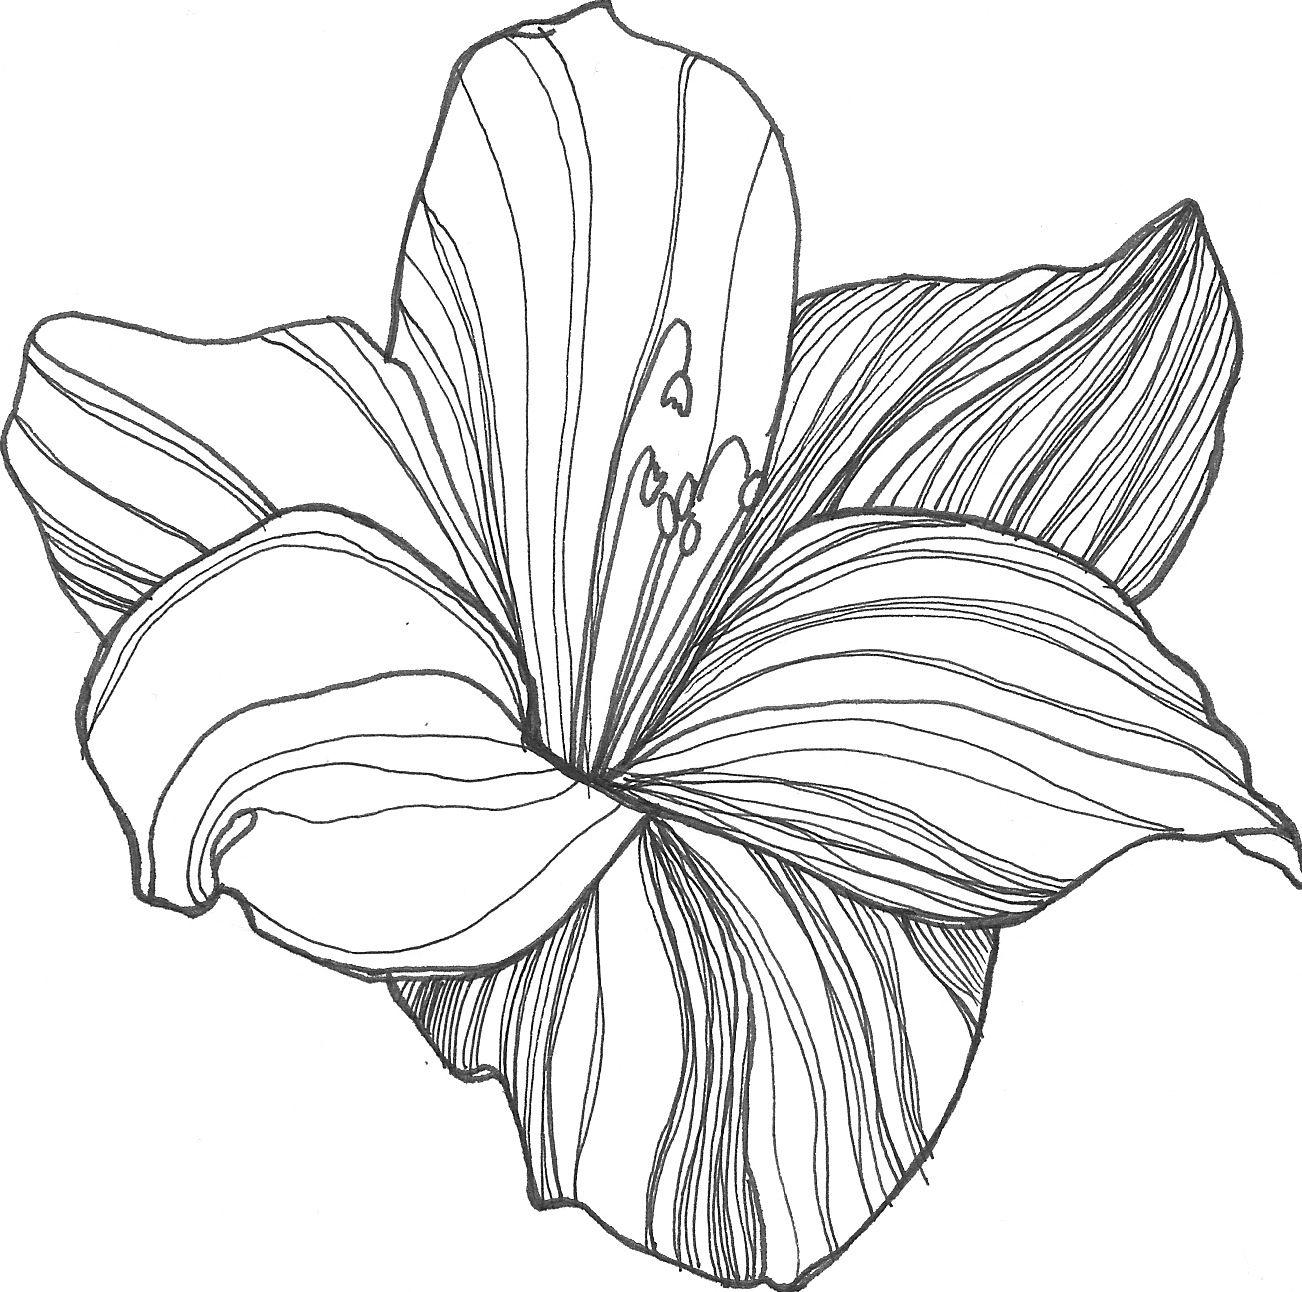 Uncategorized Flowers Draw nicole illustration flower power patterns pinterest power